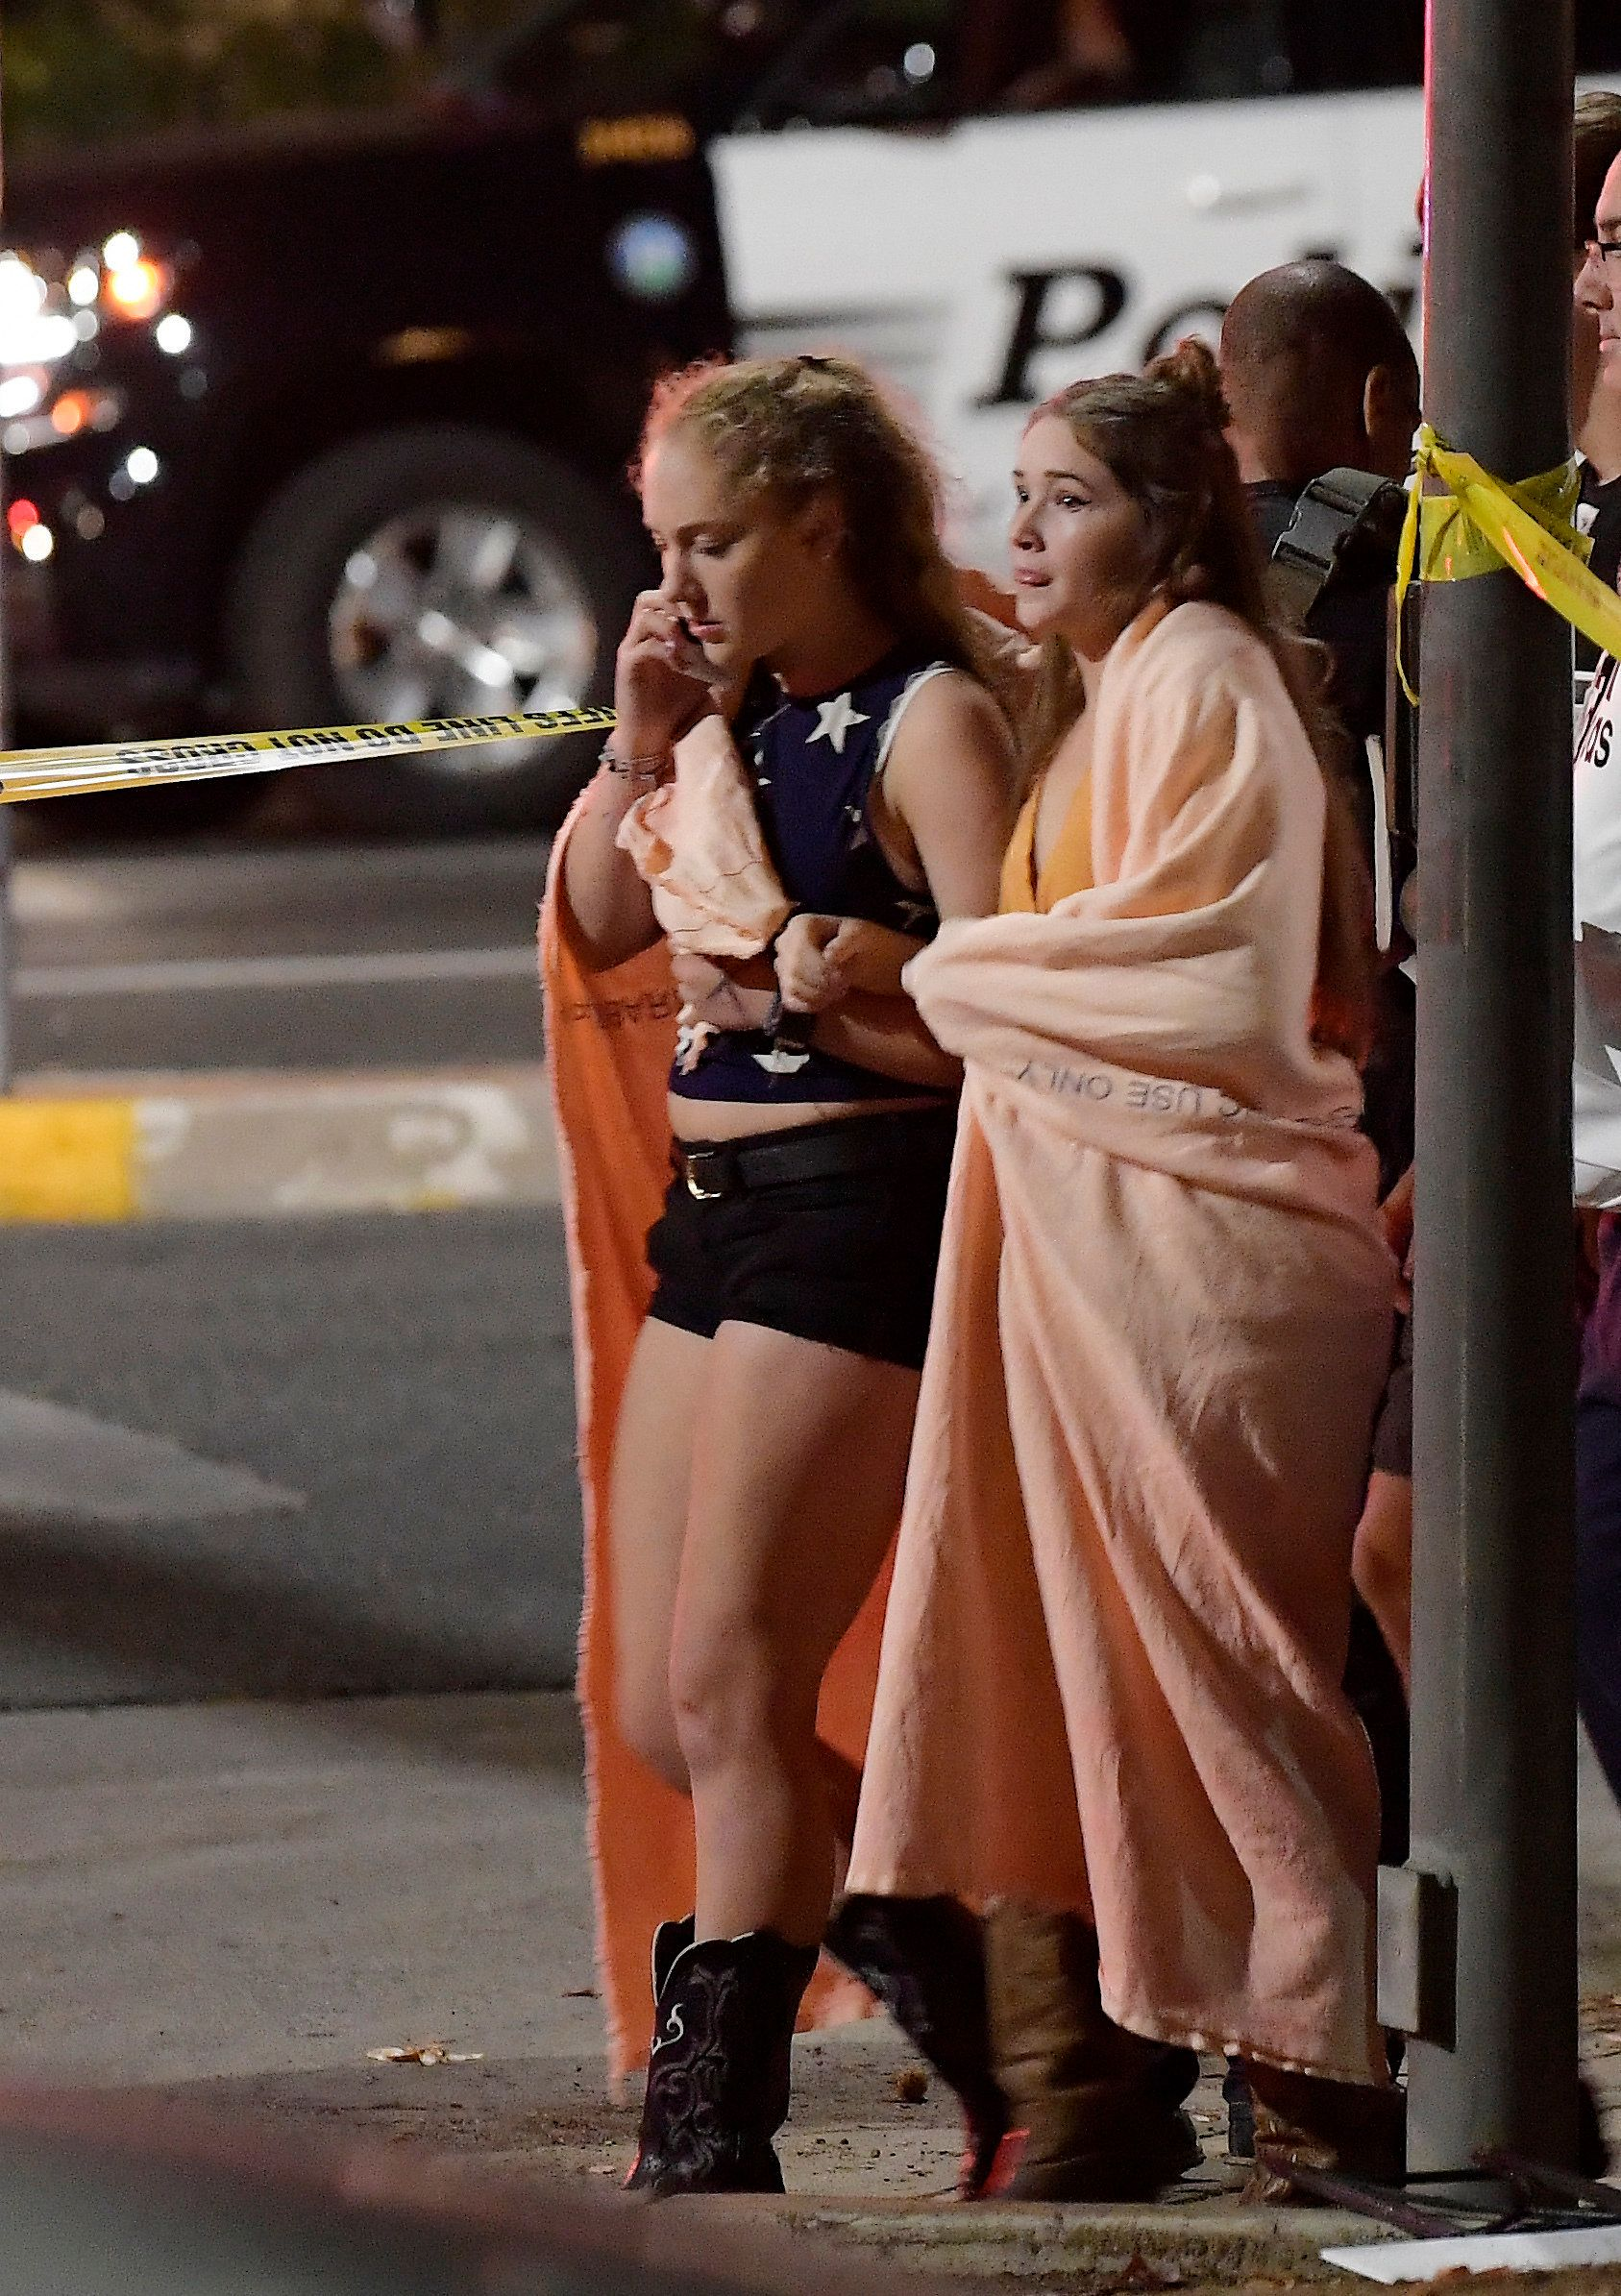 Gunman Kills At Least 12 In Thousand Oaks, California, Bar Shooting